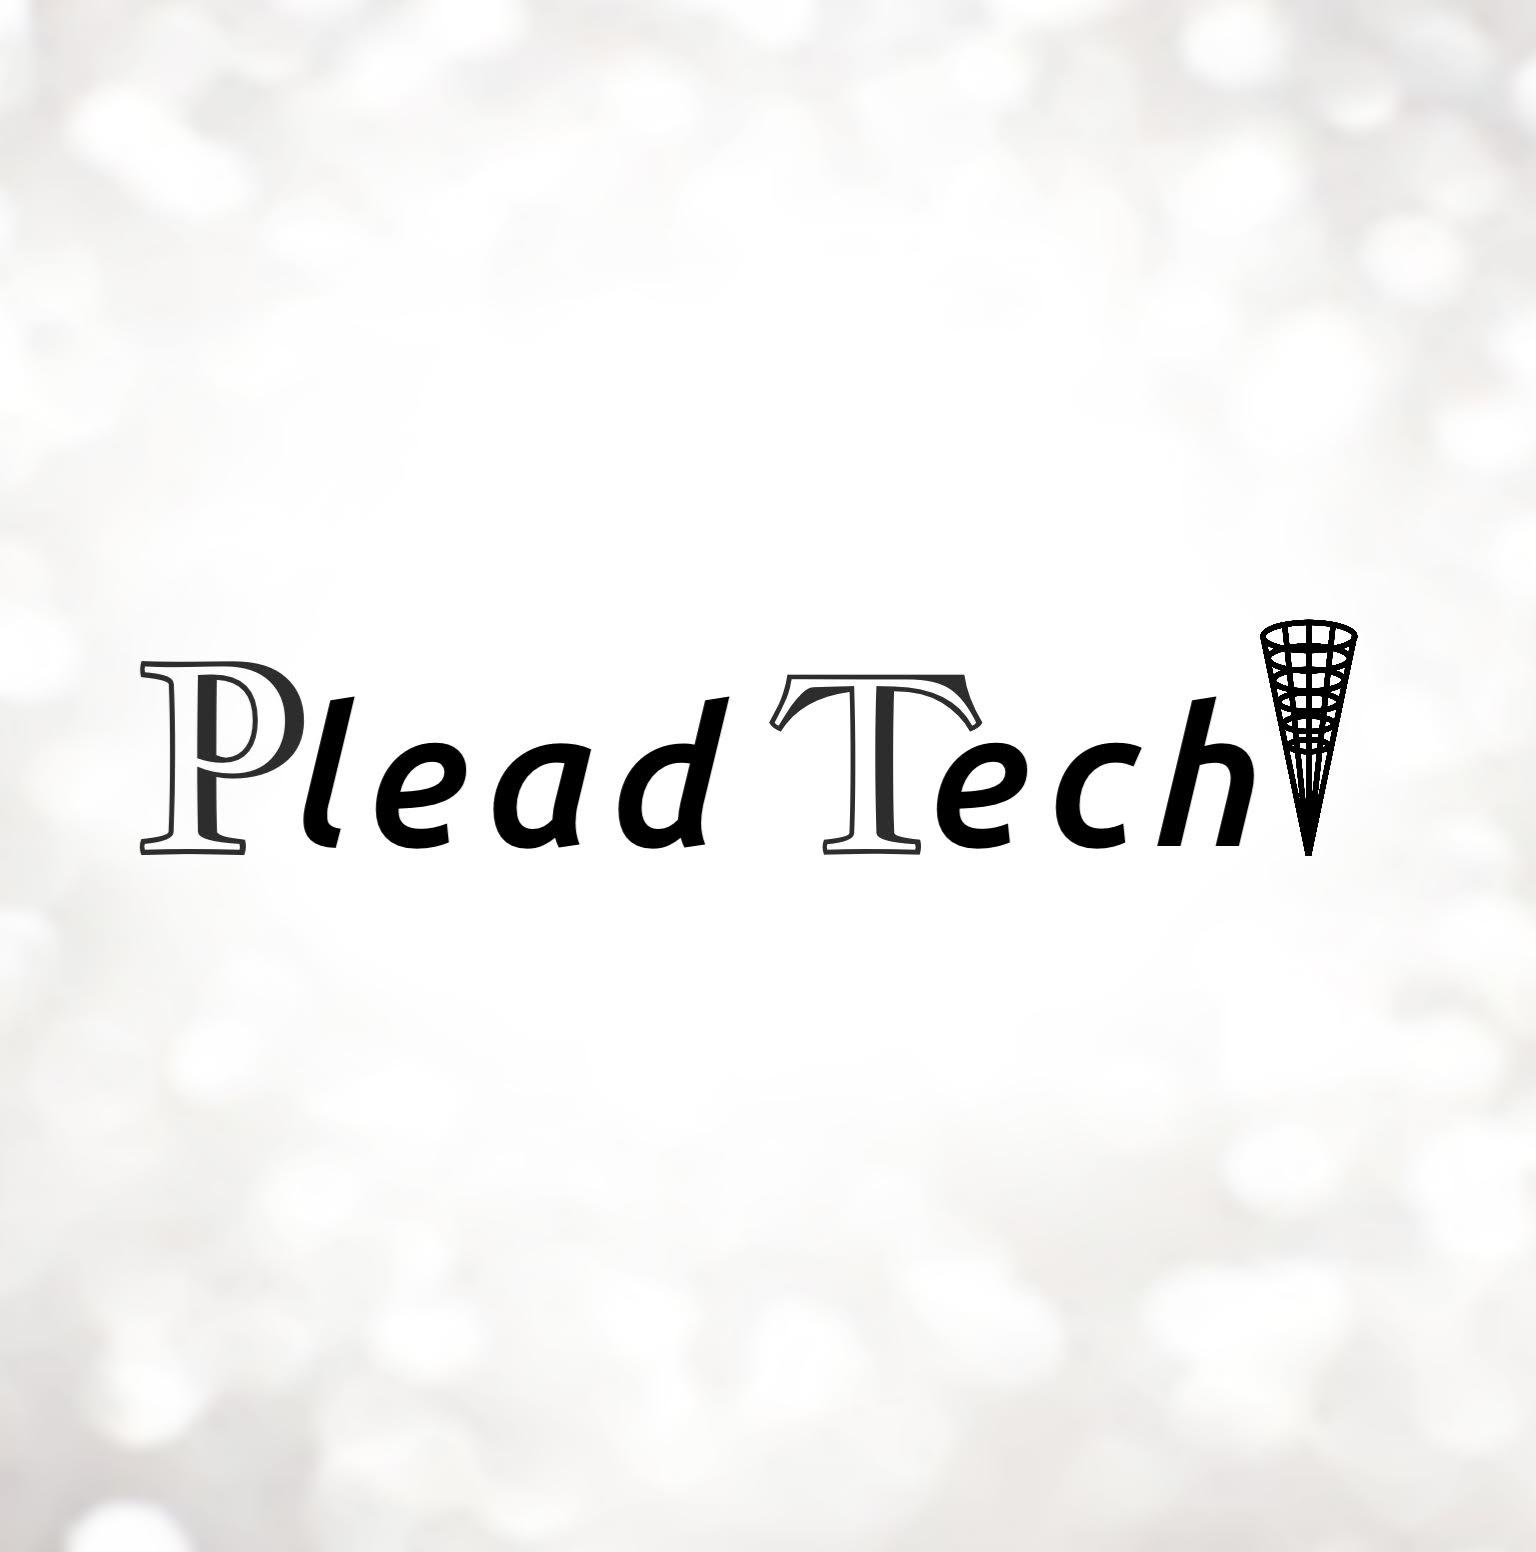 Plead the Technology